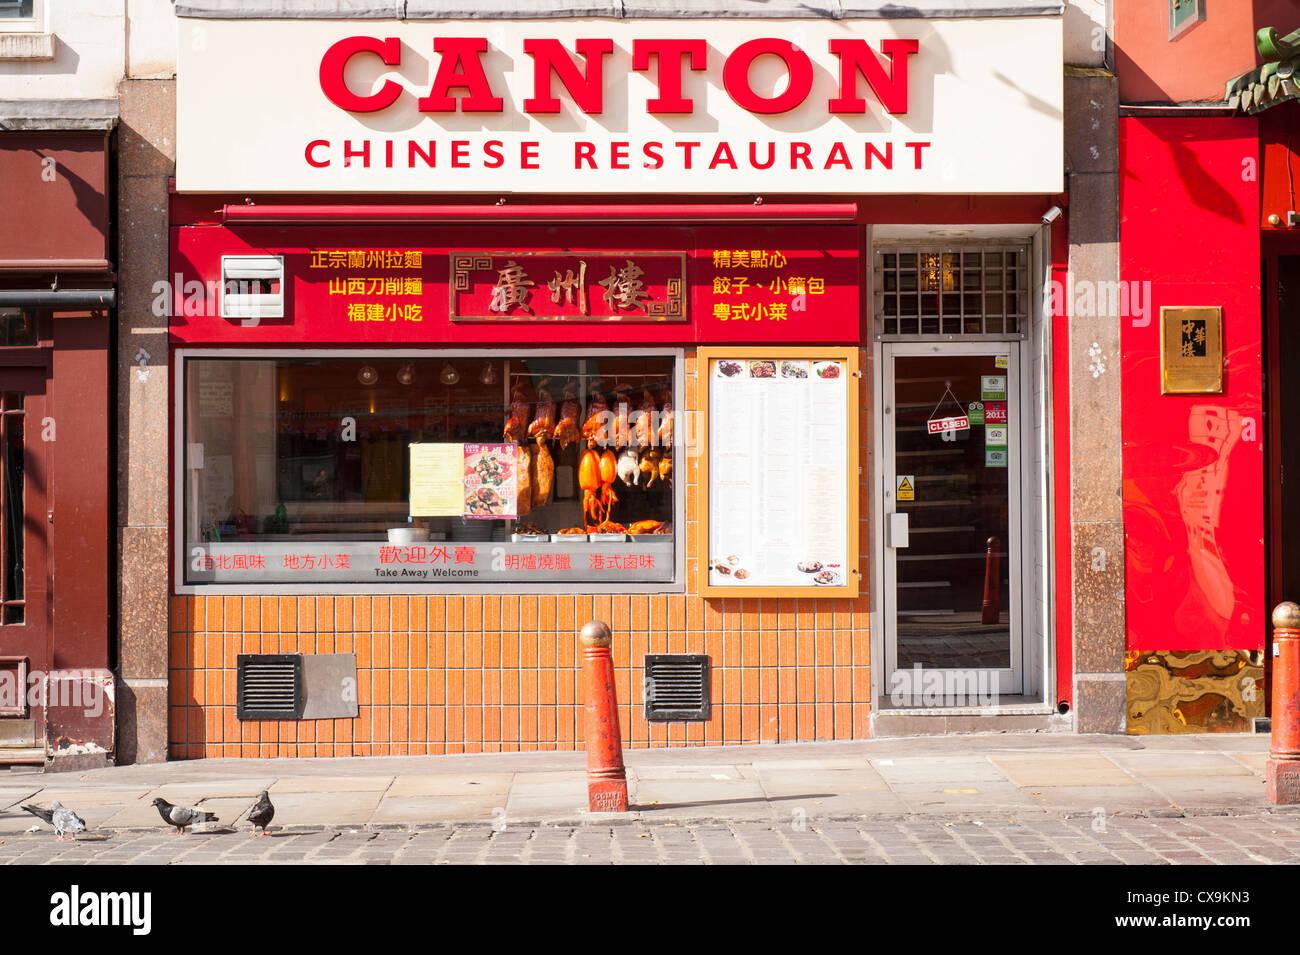 West End Asian Restaurant